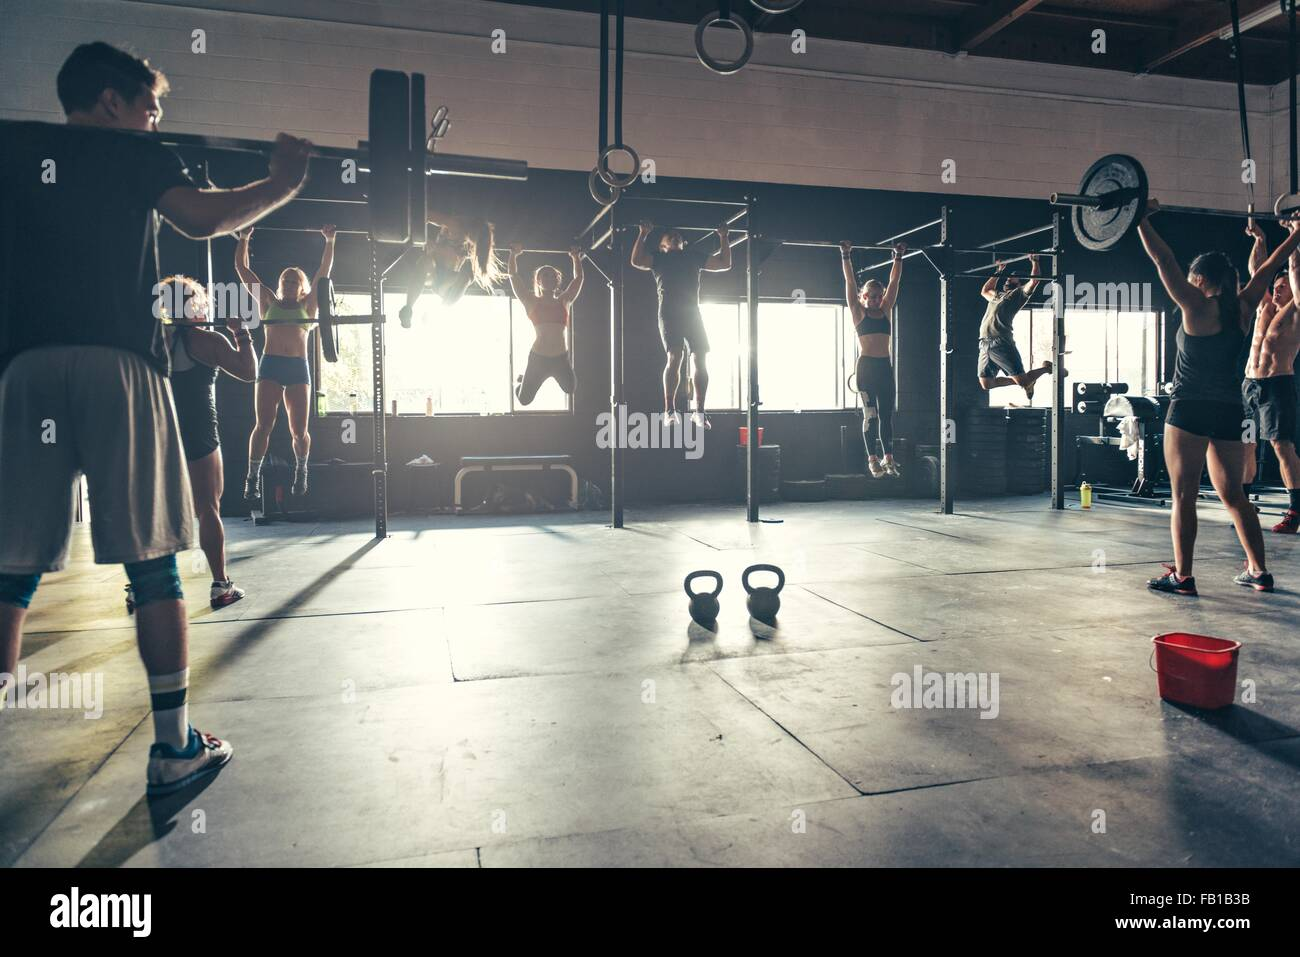 Team training using varied equipment in gym - Stock Image